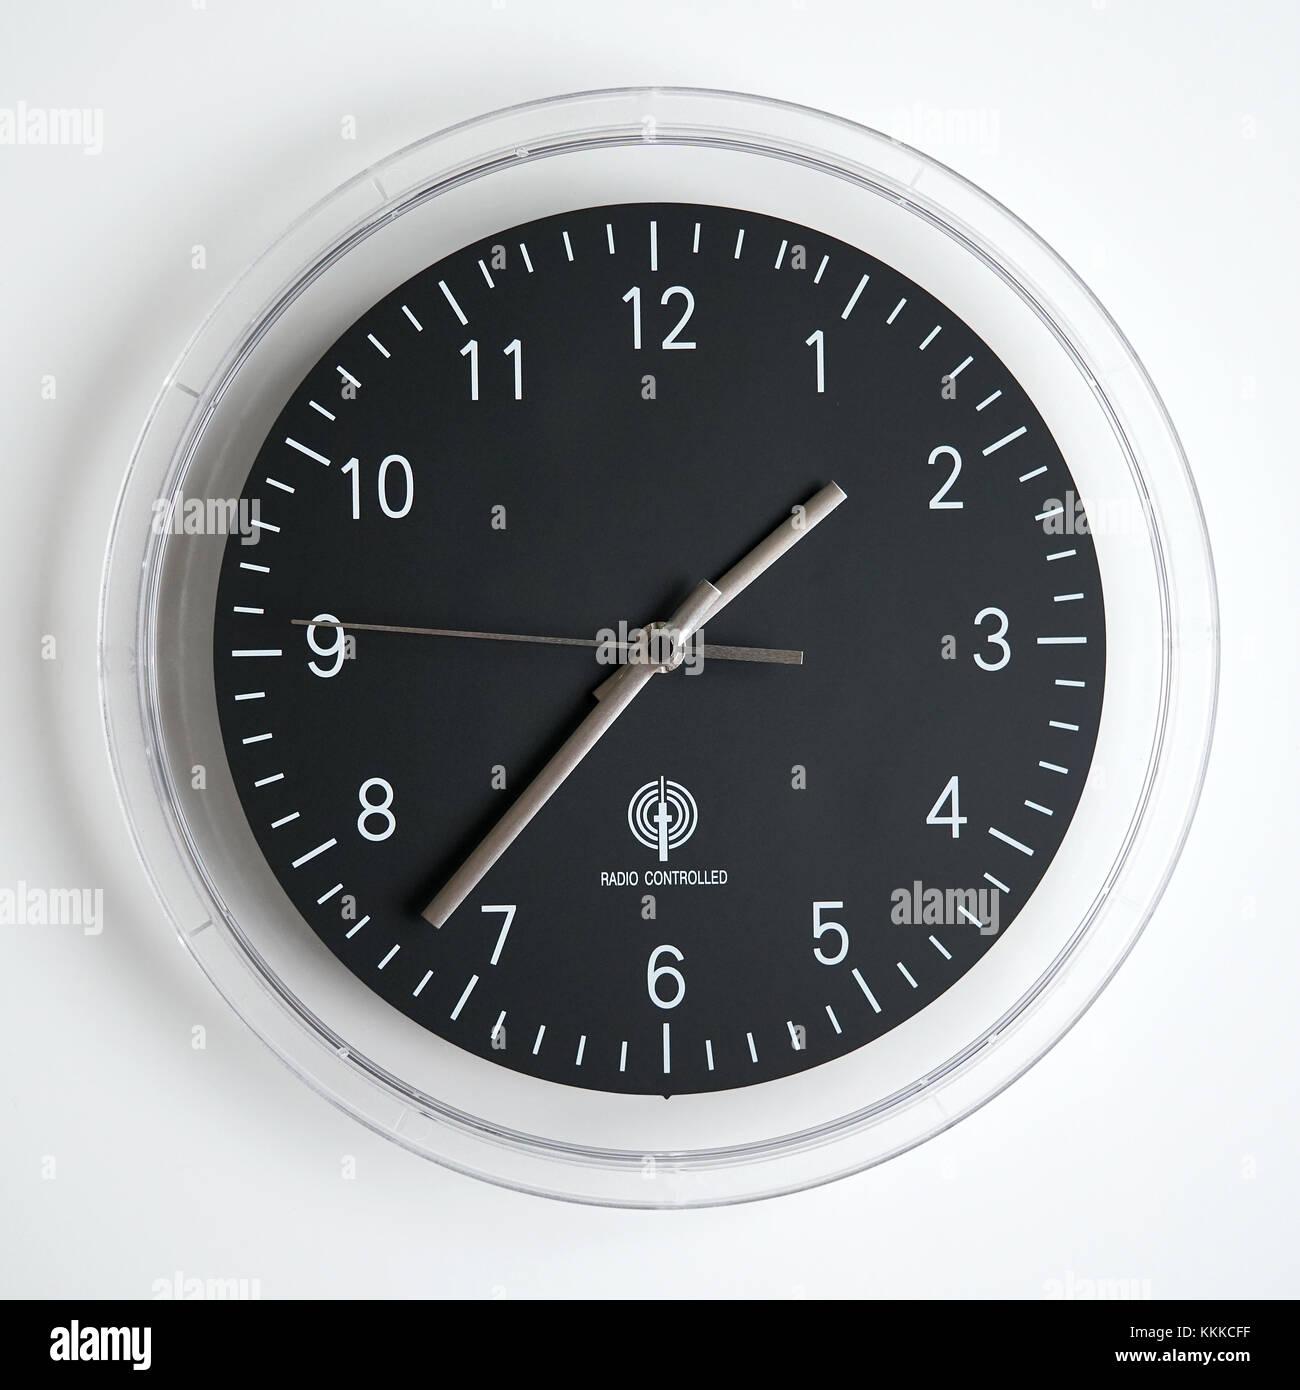 radio controlled wall clock - Stock Image